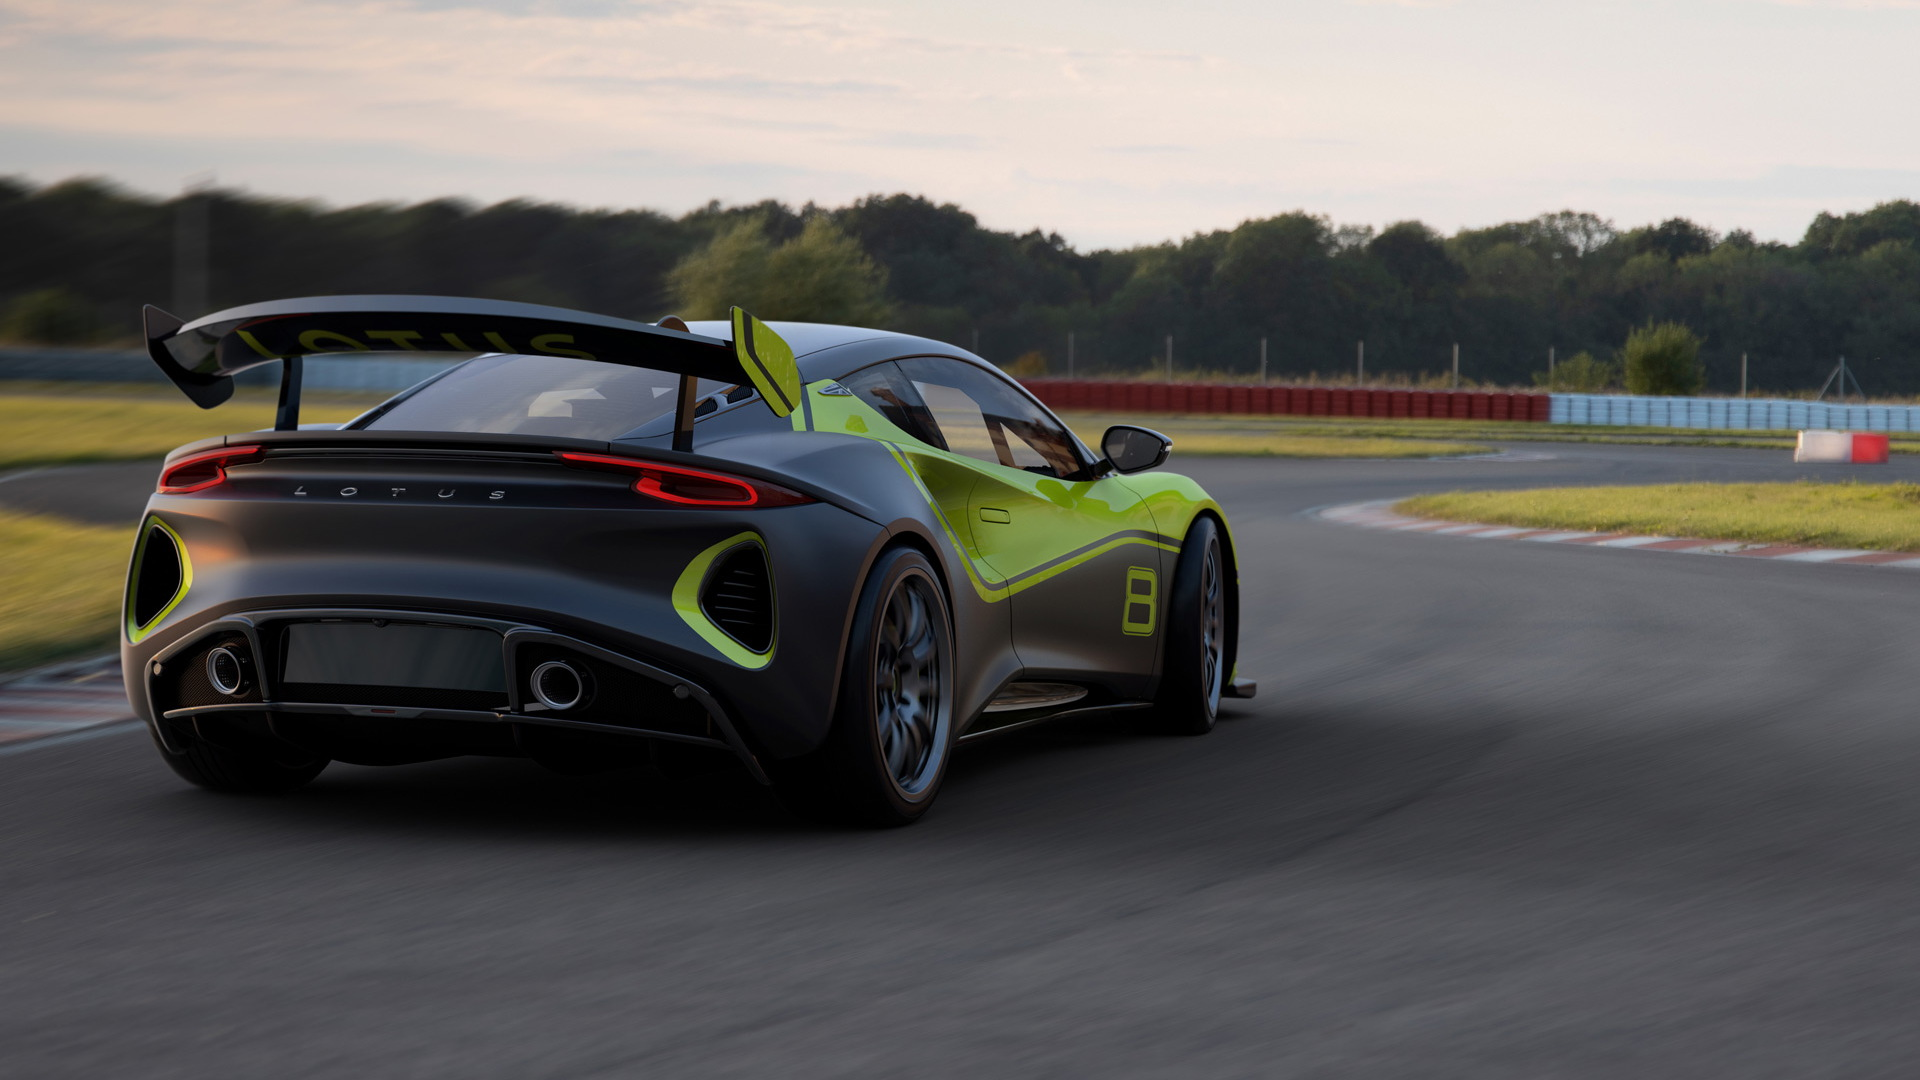 2022 Lotus Emira GT4 race car